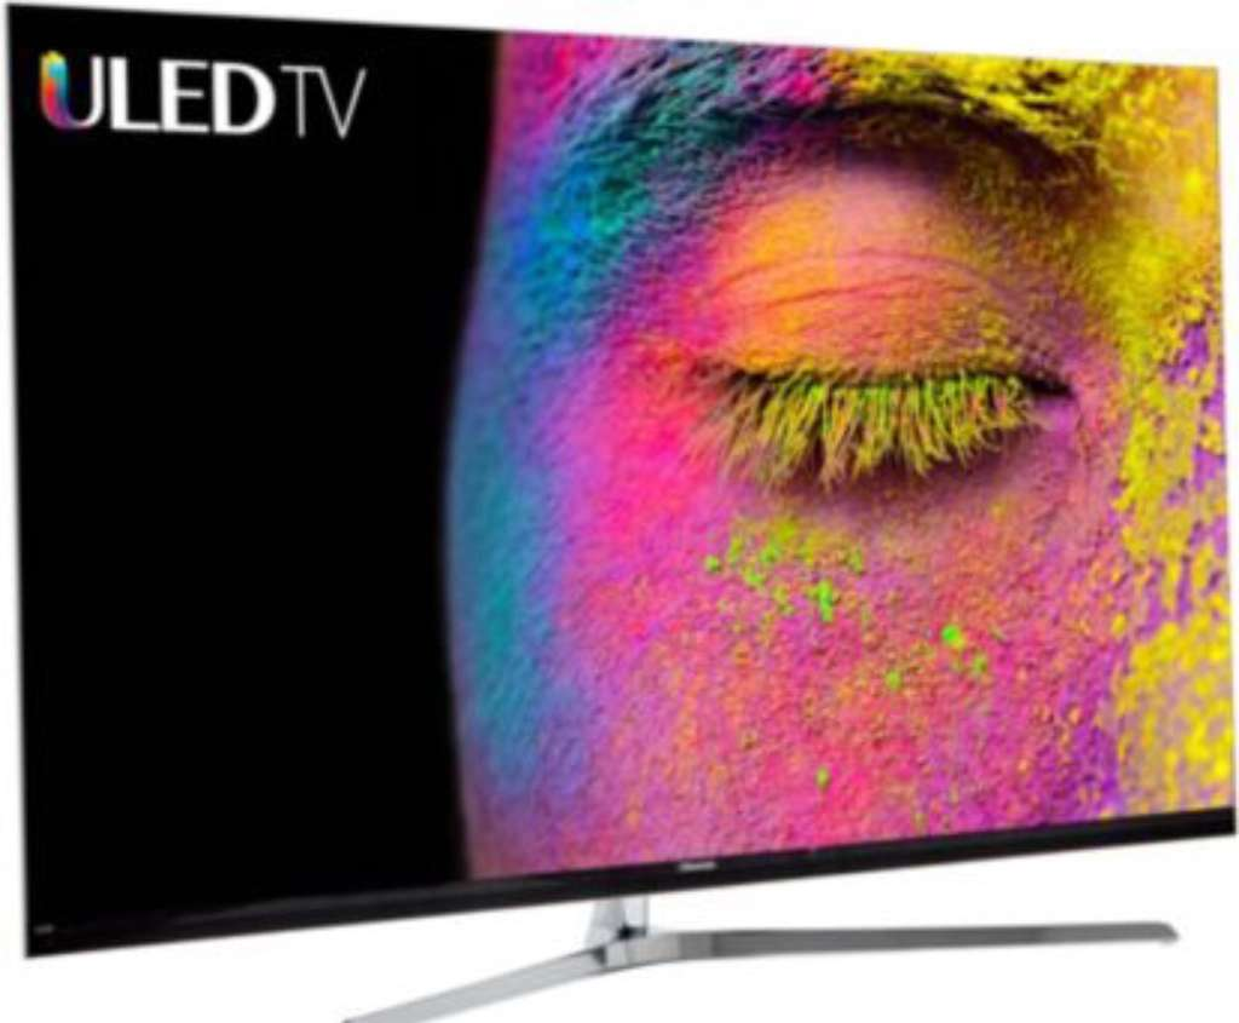 tv 65 hisense 65nu8700 4k garantie 5 ans rembours e. Black Bedroom Furniture Sets. Home Design Ideas